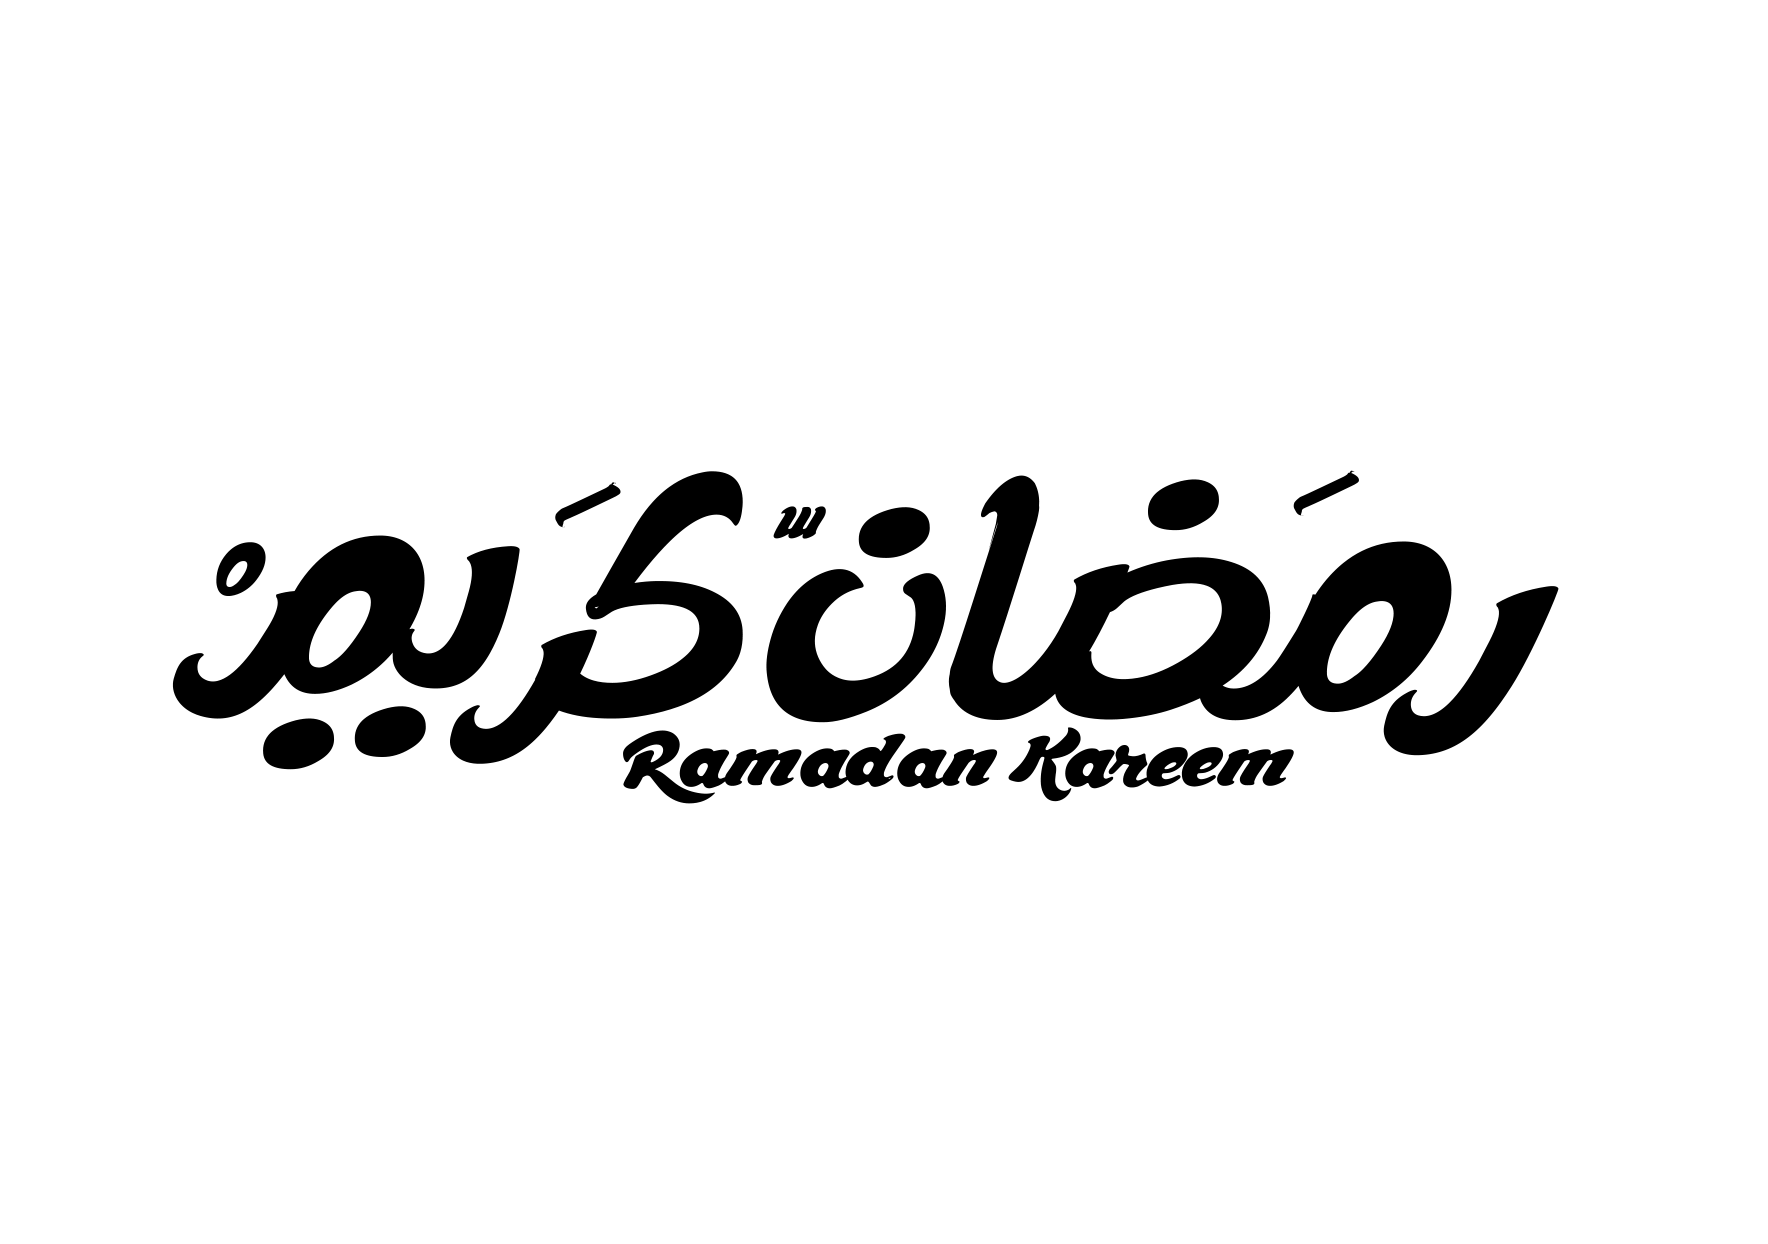 مخطوطه رمضان كريم مفرغه 11 15 مخطوطه لشهر رمضان بالخط الحر png